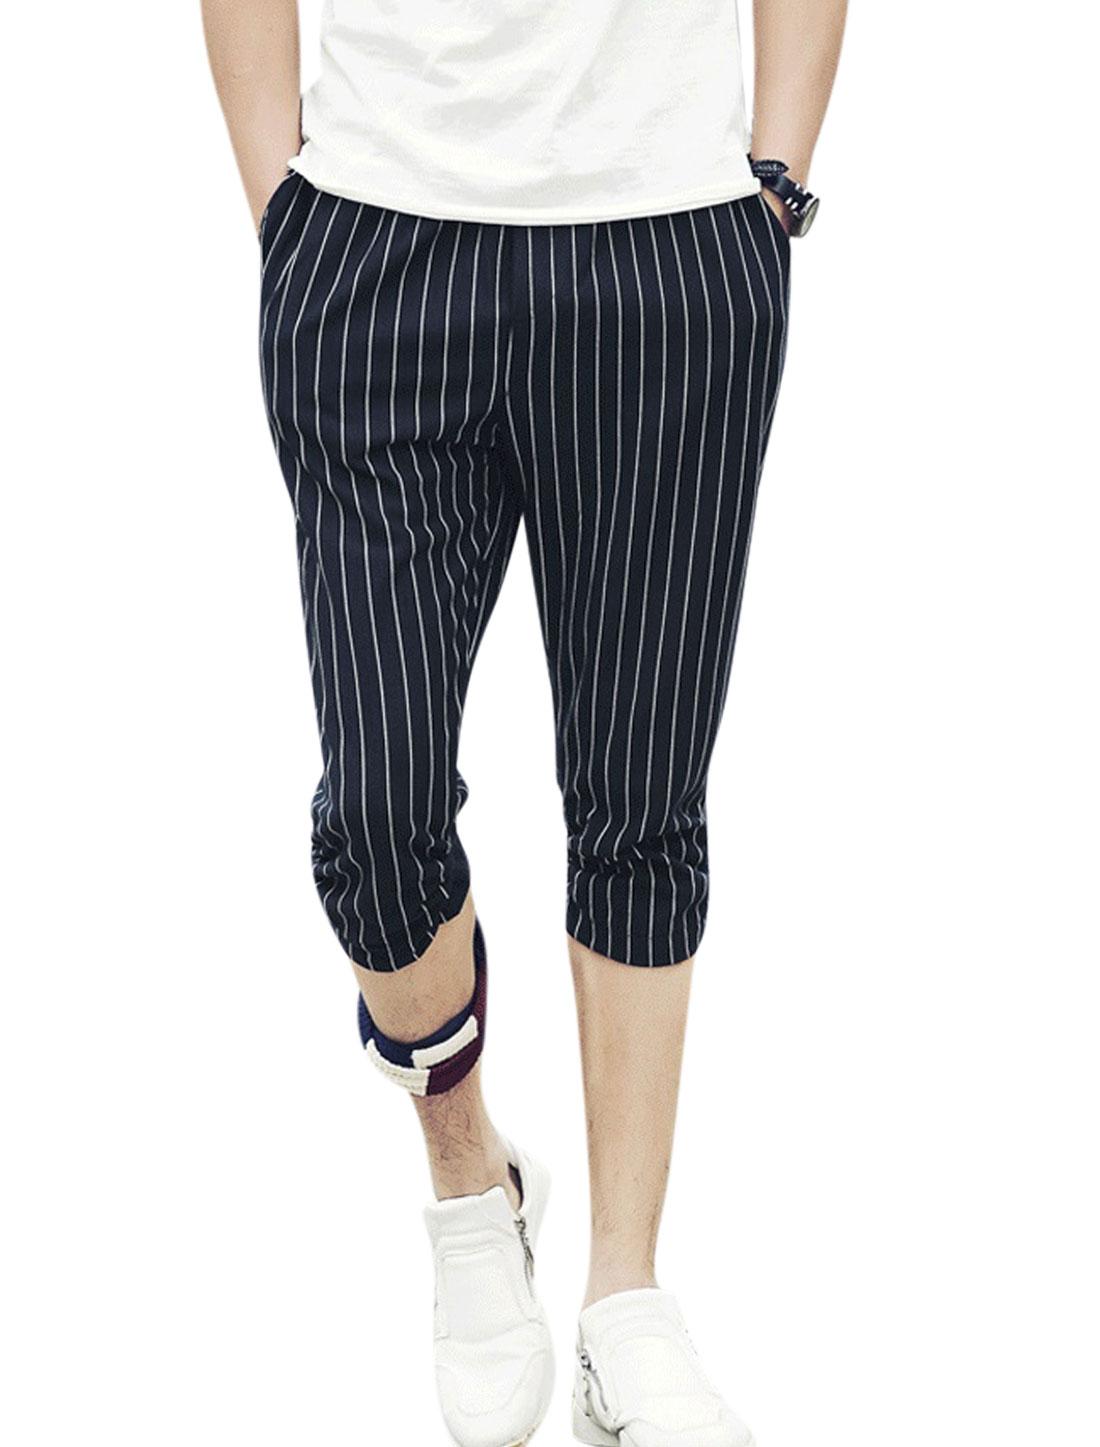 Men Elasitc Waist Stripes Print Pockets Slim Fit Capris Pants Navy Blue W30